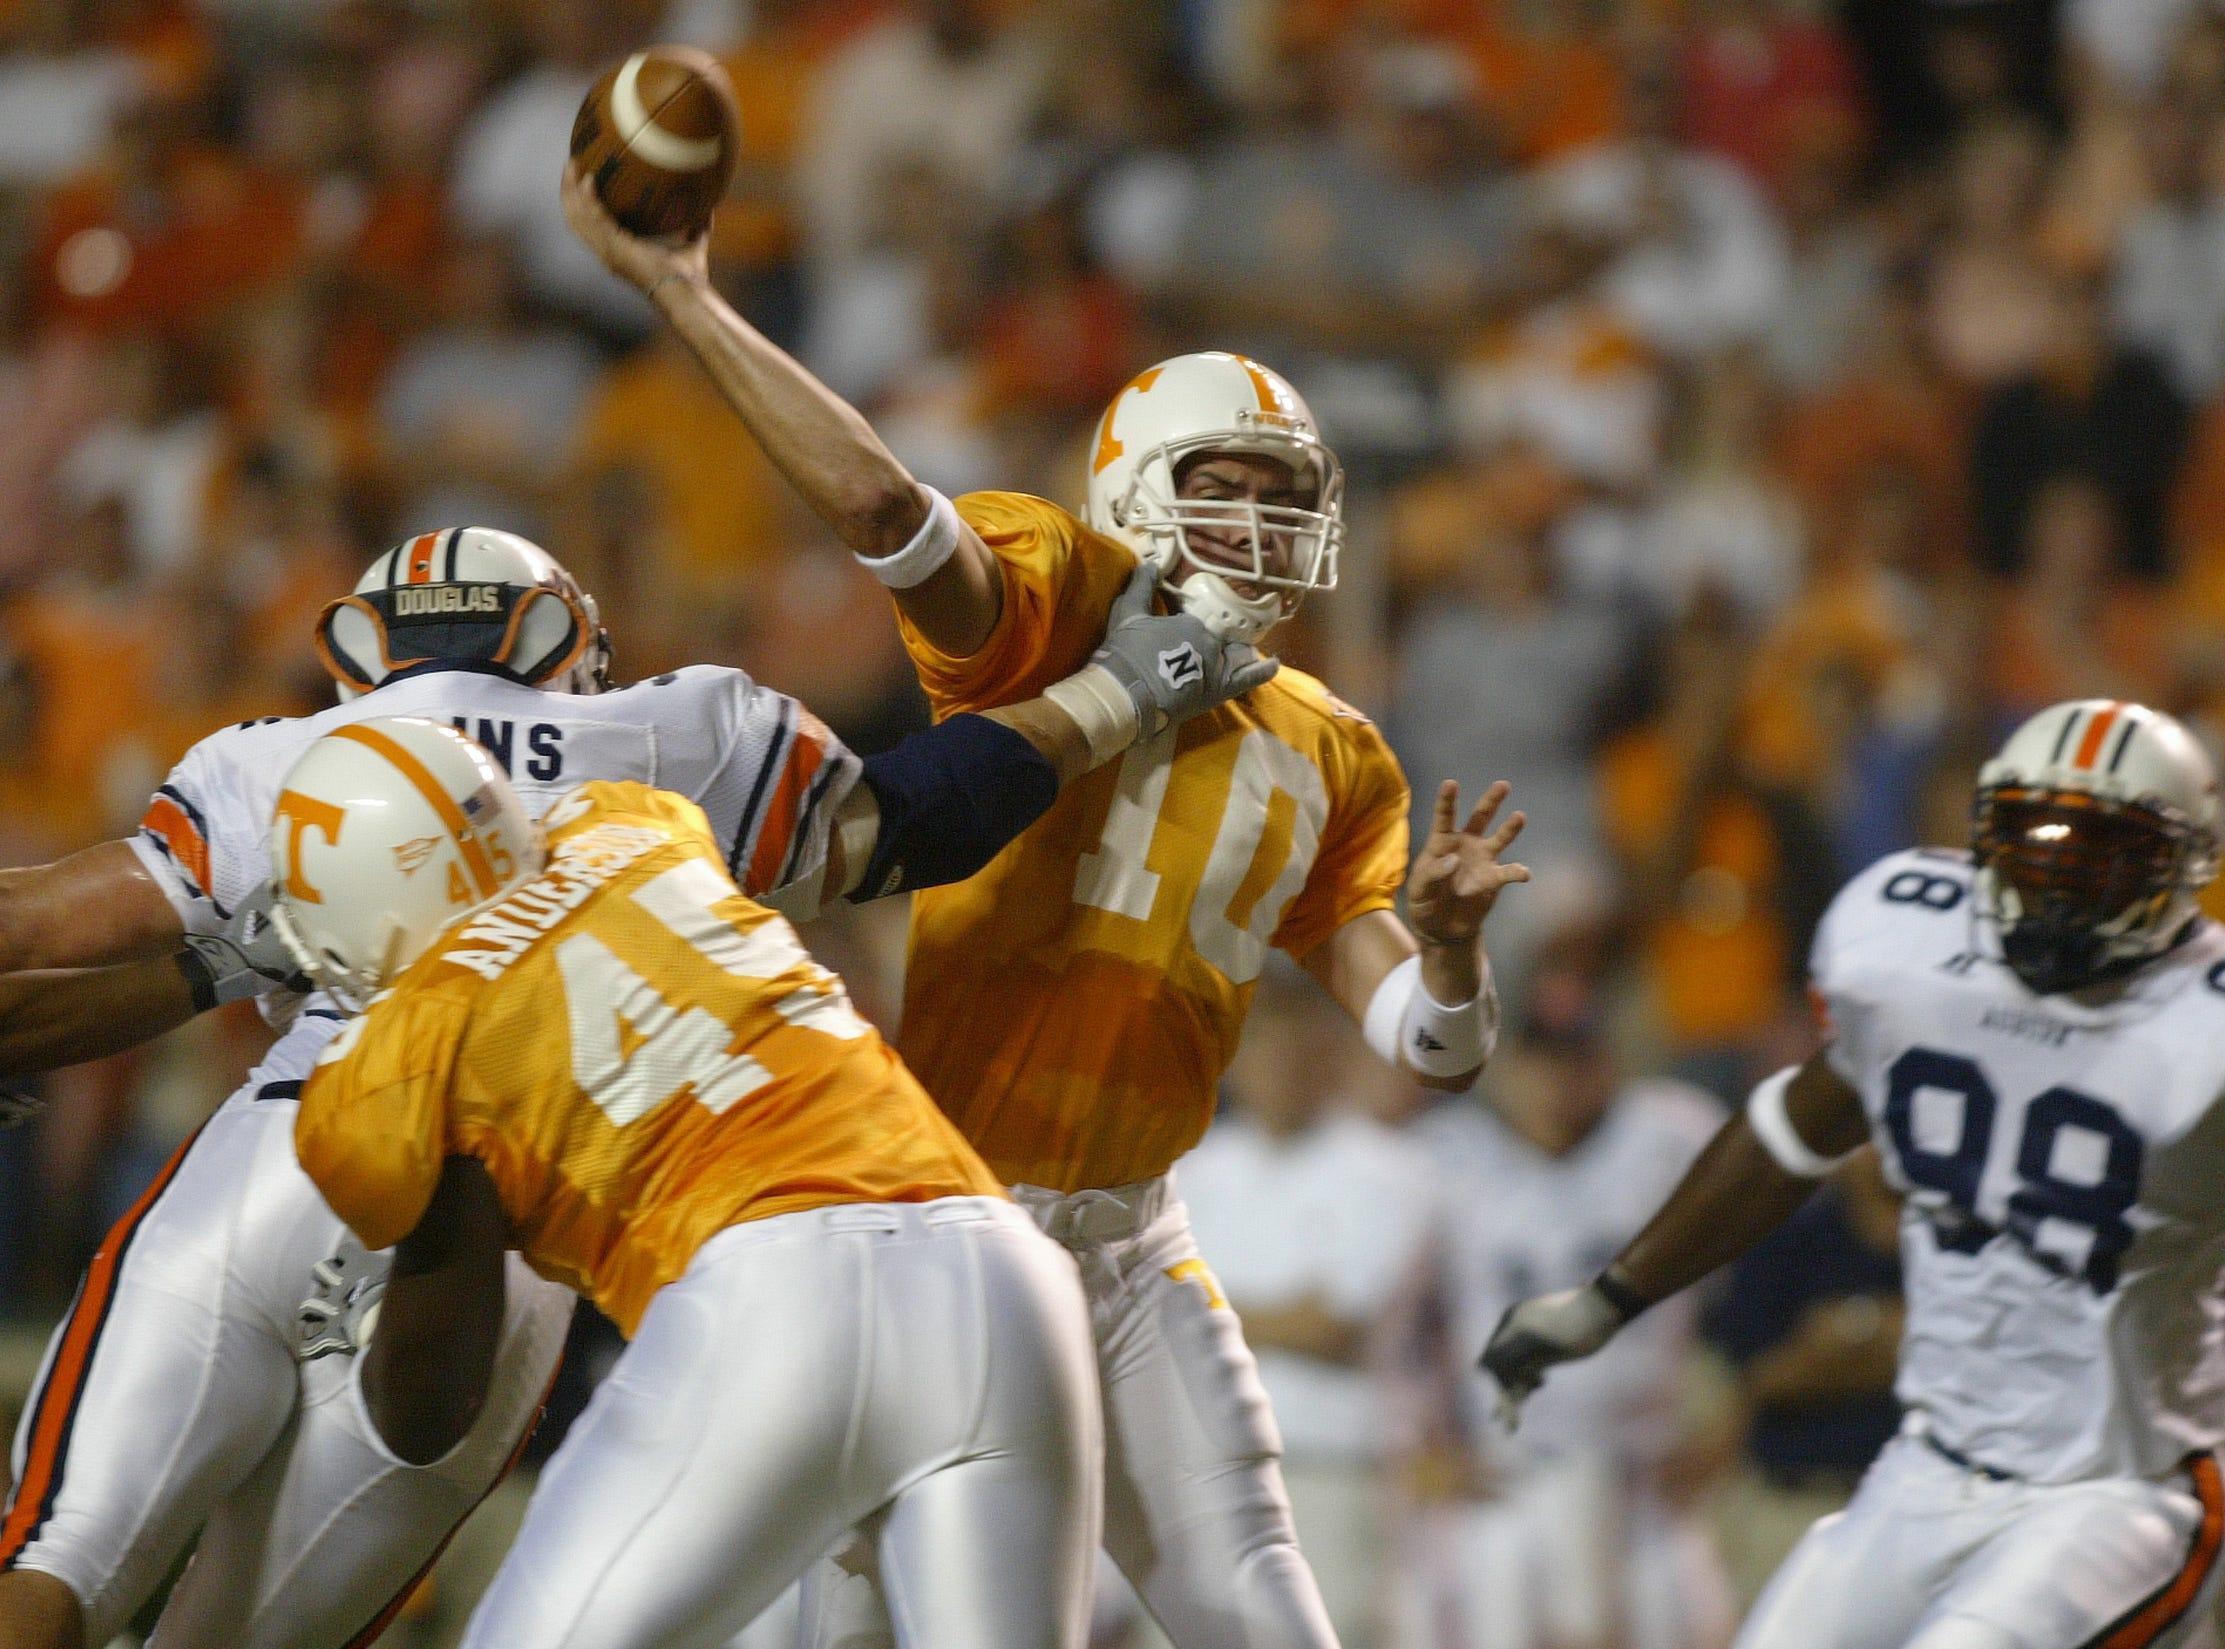 Tennessee quarterback Erik Ainge is pressured by Auburn defensive end Bret Eddins Saturday at Neyland Stadium. Fullback Cory Anderson blocks on the play. 10/02/04